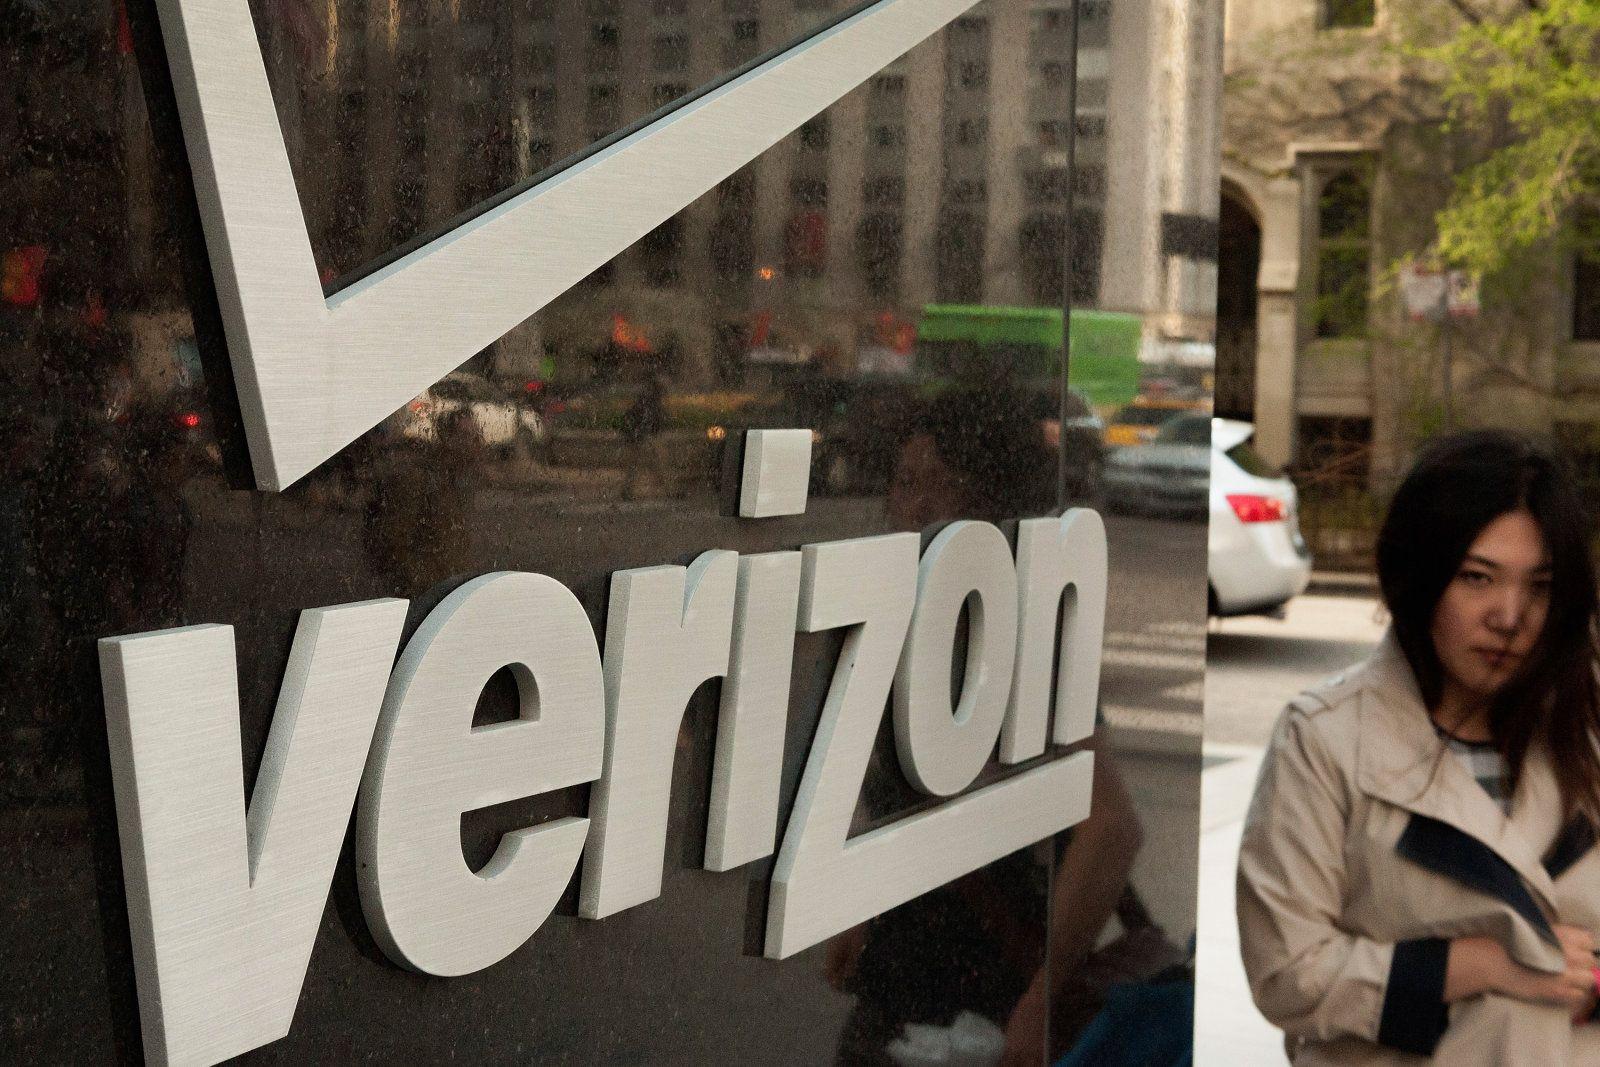 Verizon partner exposes 14 million customer records